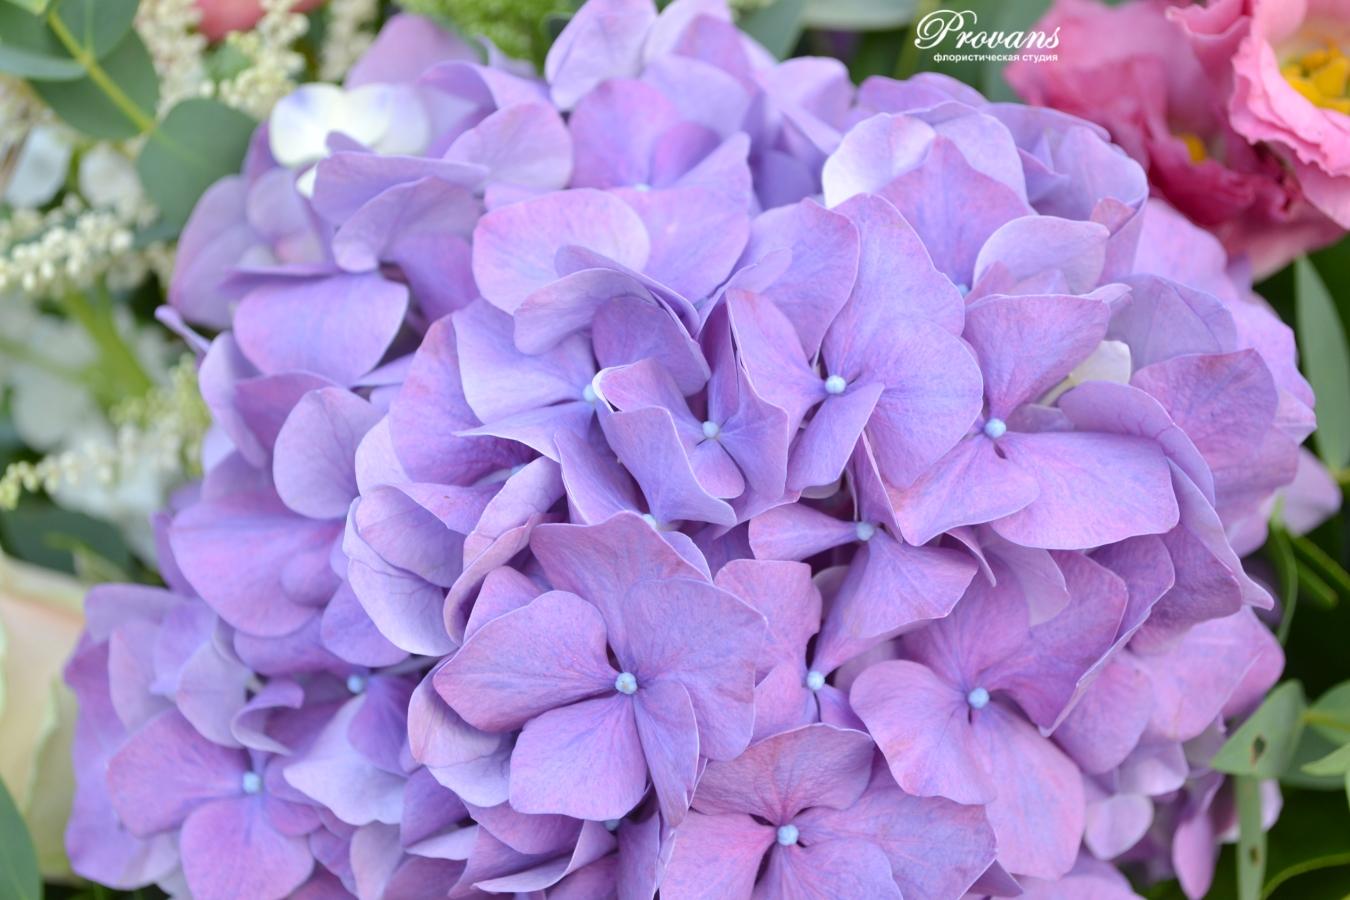 Корзина с цветами. Гортензия, пионовидная роза